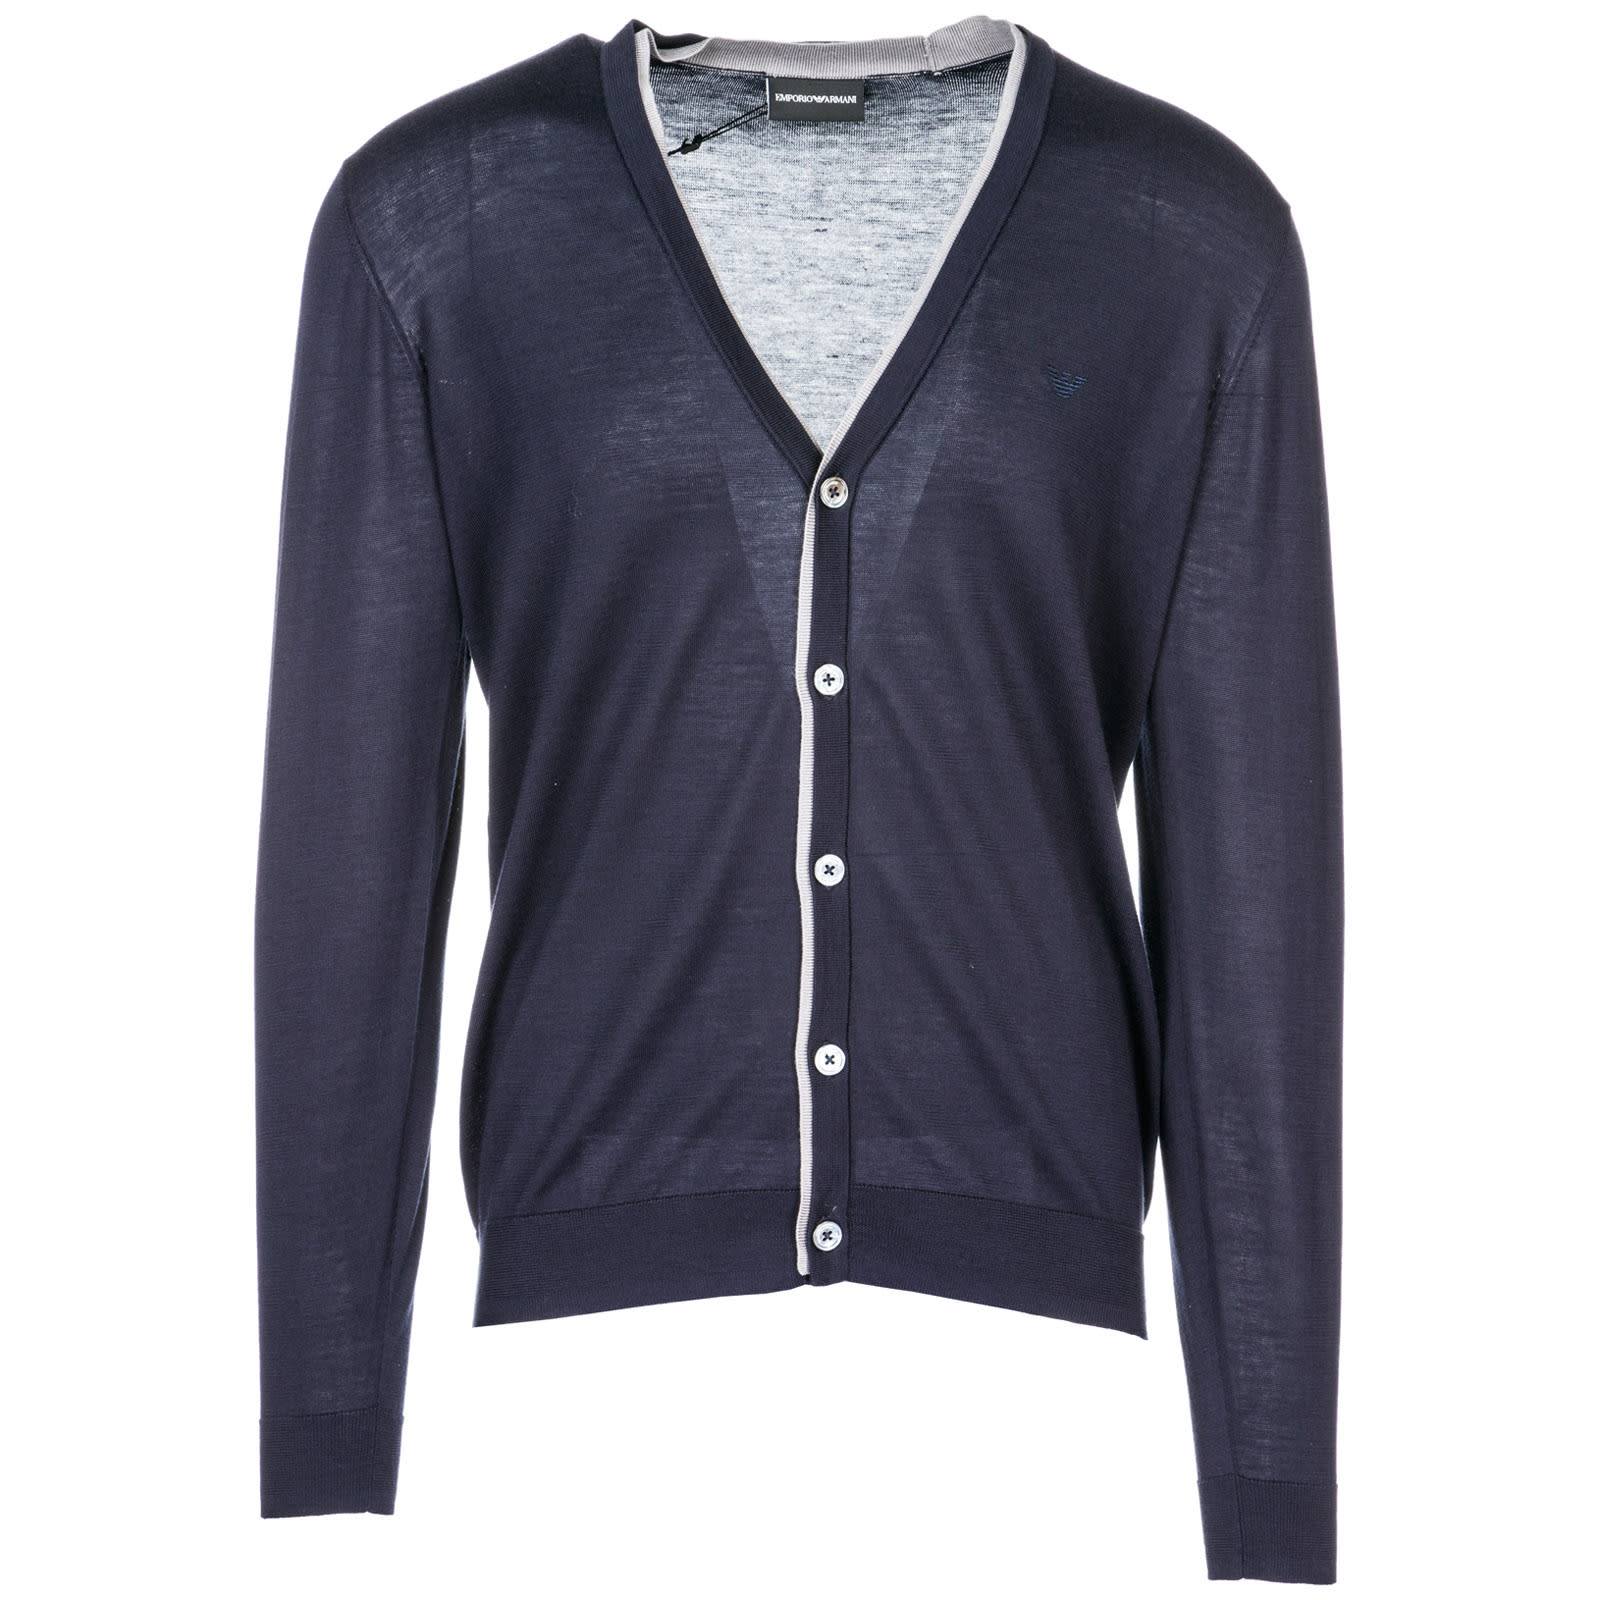 e3786beff Emporio Armani Jumper Sweater Cardigan Regular Fit